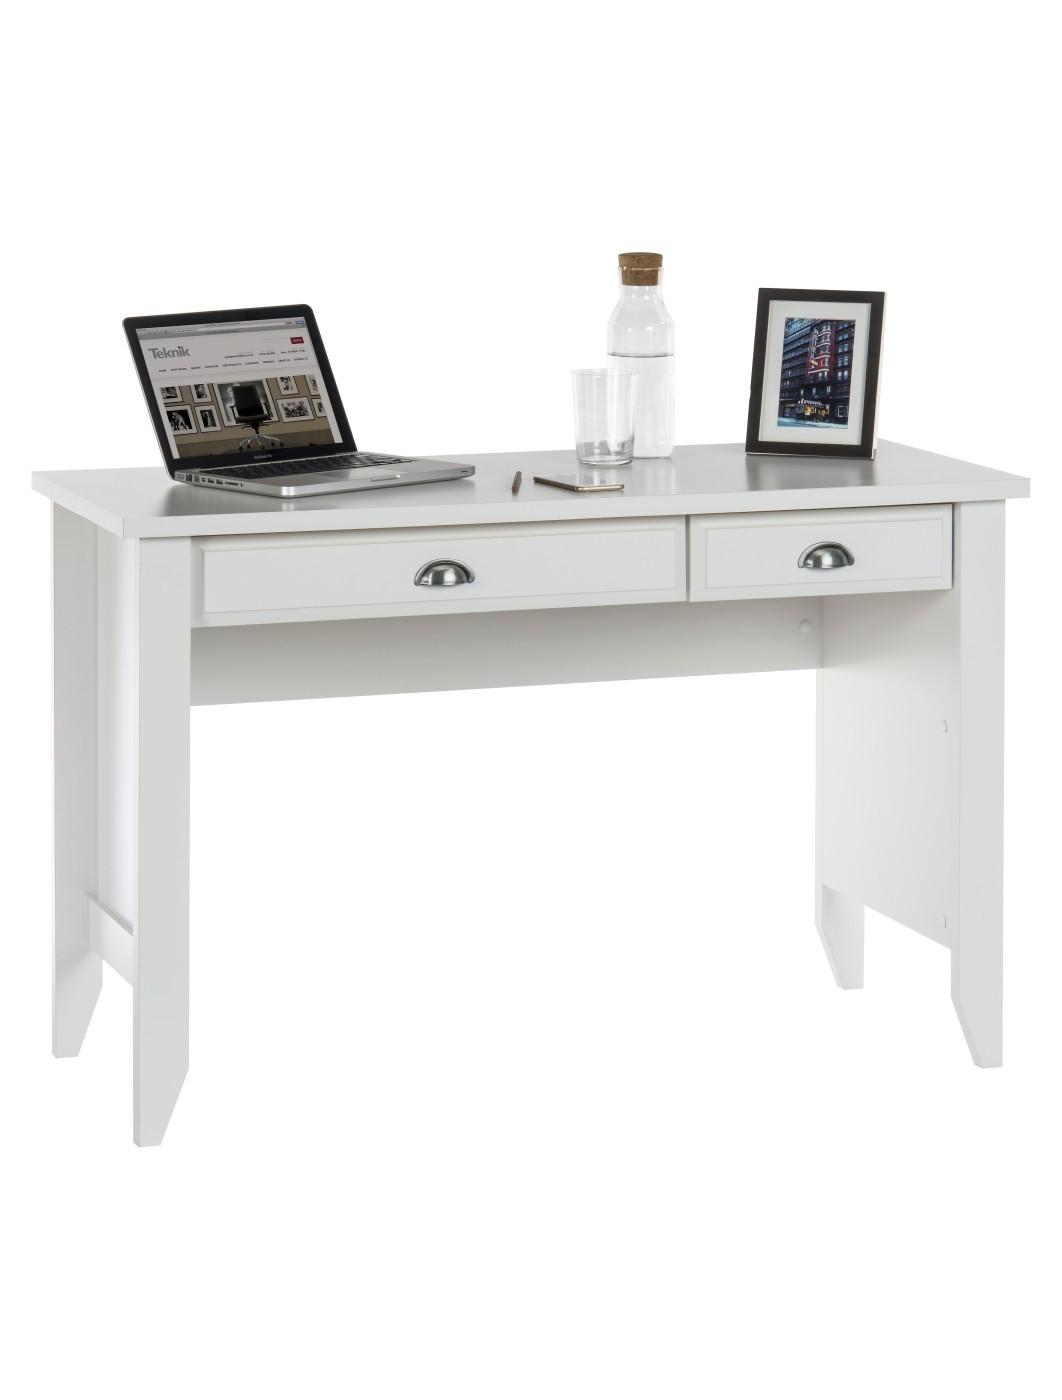 teknik laptop desk soft white 5411204 121 office furniture